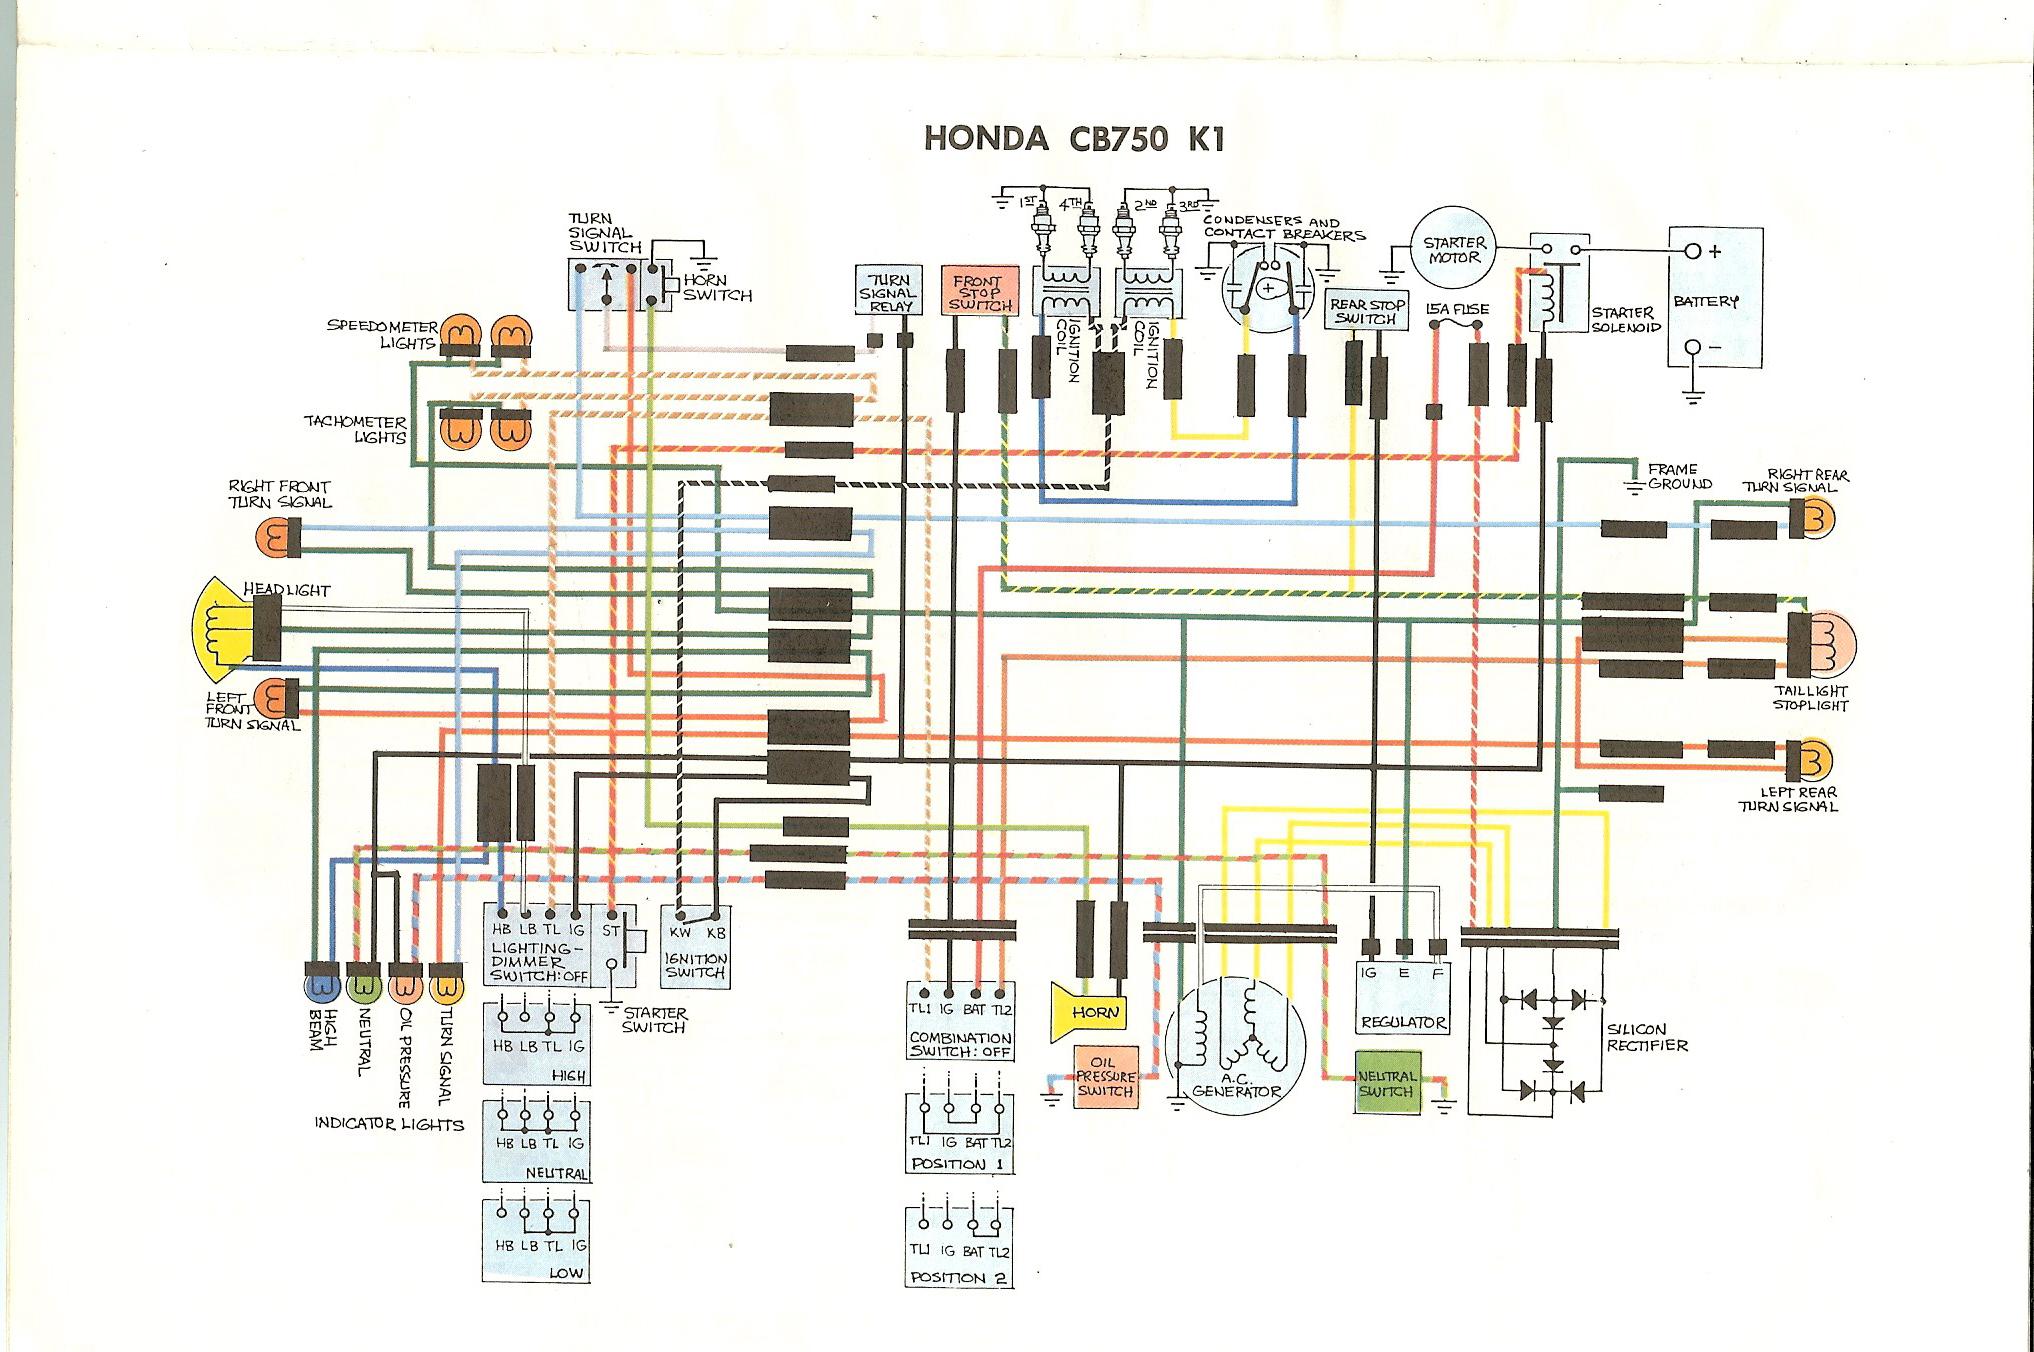 1971 Ct90 Wiring Diagram Schematic Diagrams Honda Sl100 25 Images